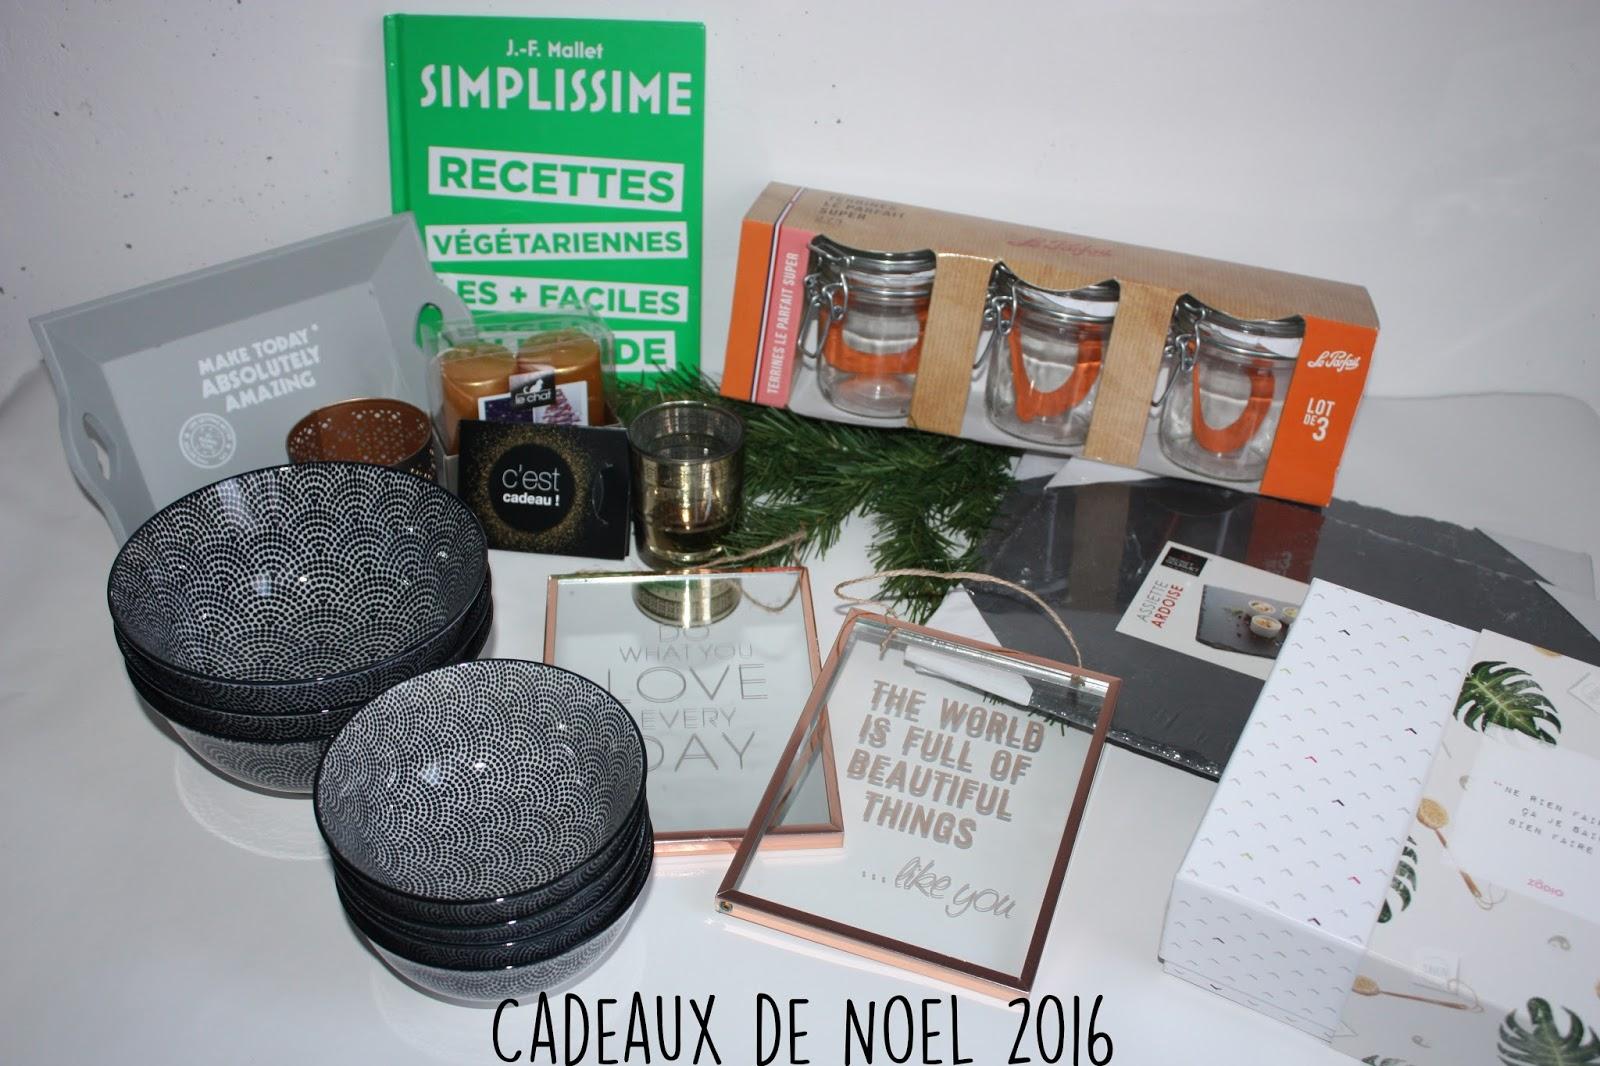 http://littlexpauline.blogspot.com/2016/12/cadeaux-de-noel.html